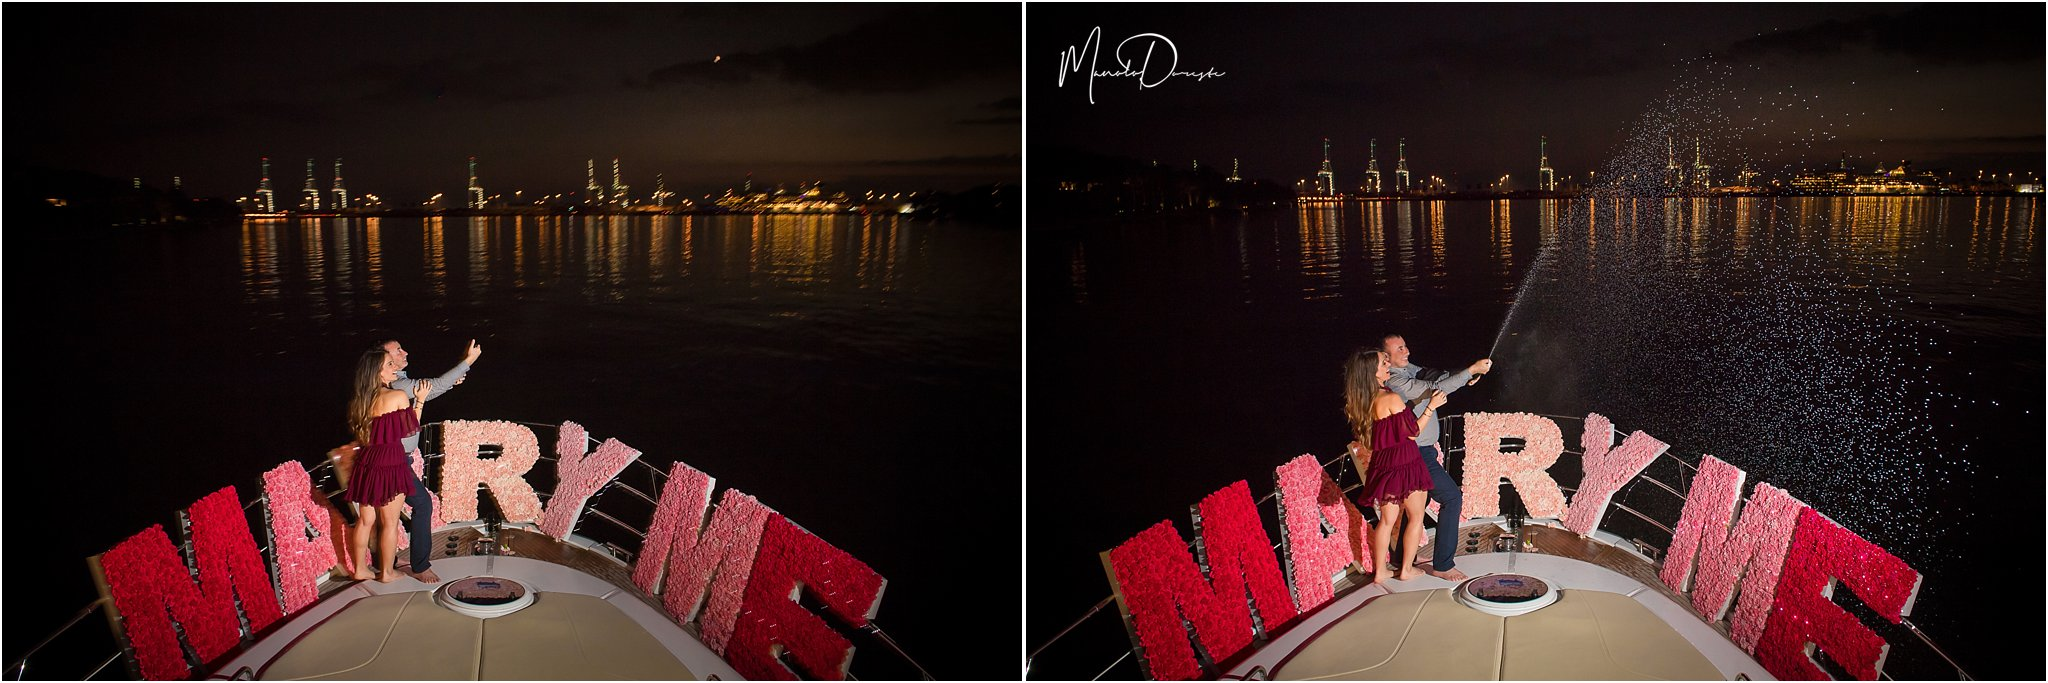 0016_ManoloDoreste_InFocusStudios_Wedding_Family_Photography_Miami_MiamiPhotographer.jpg